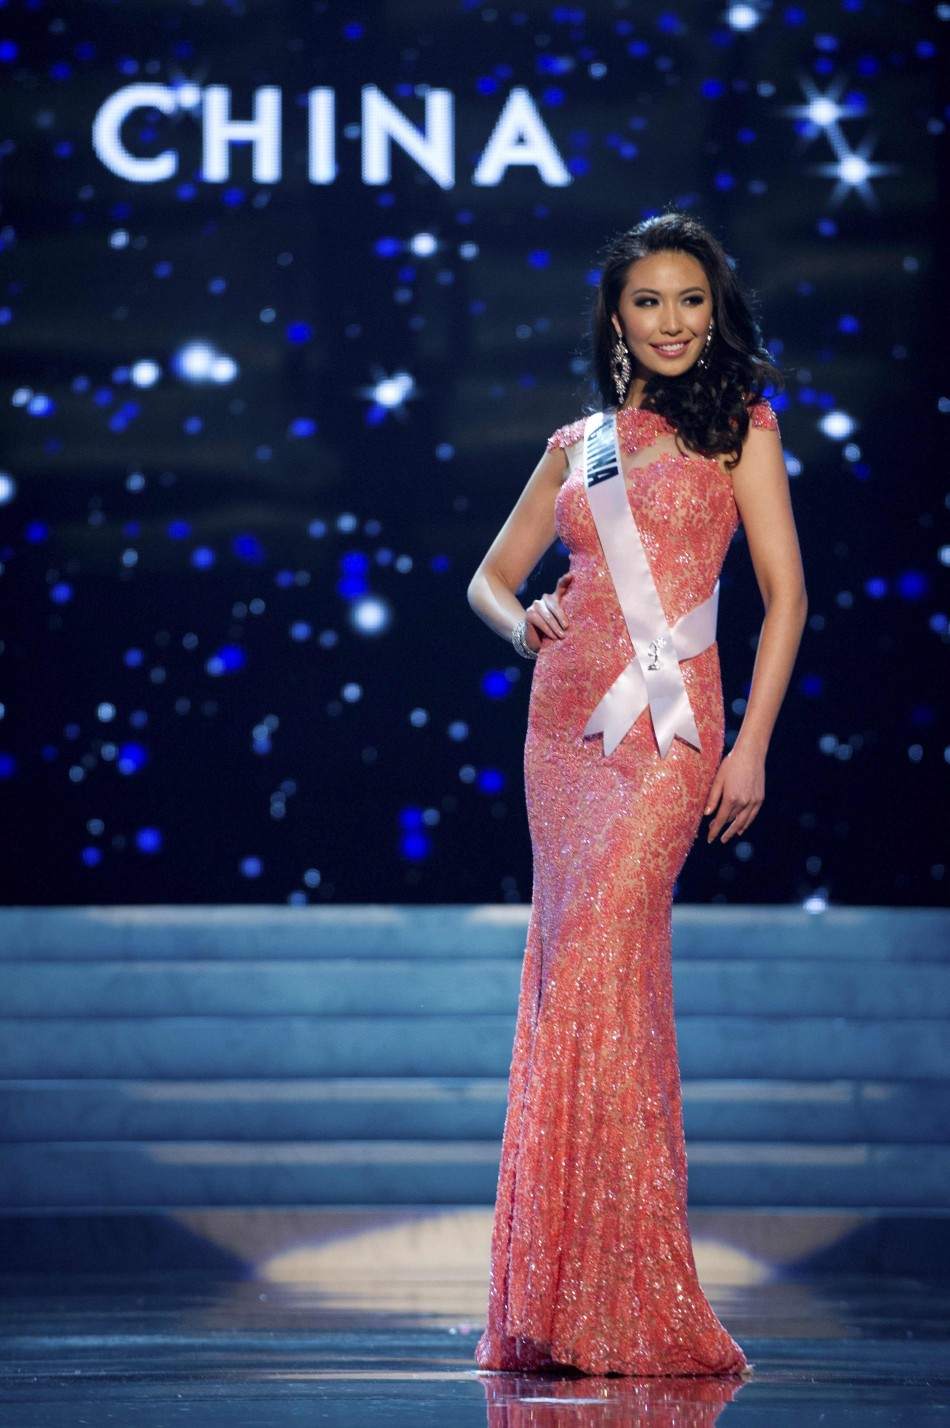 Miss China 2012 Ji Dan Xu competes during 2012 Miss Universe Presentation Show in Las Vegas